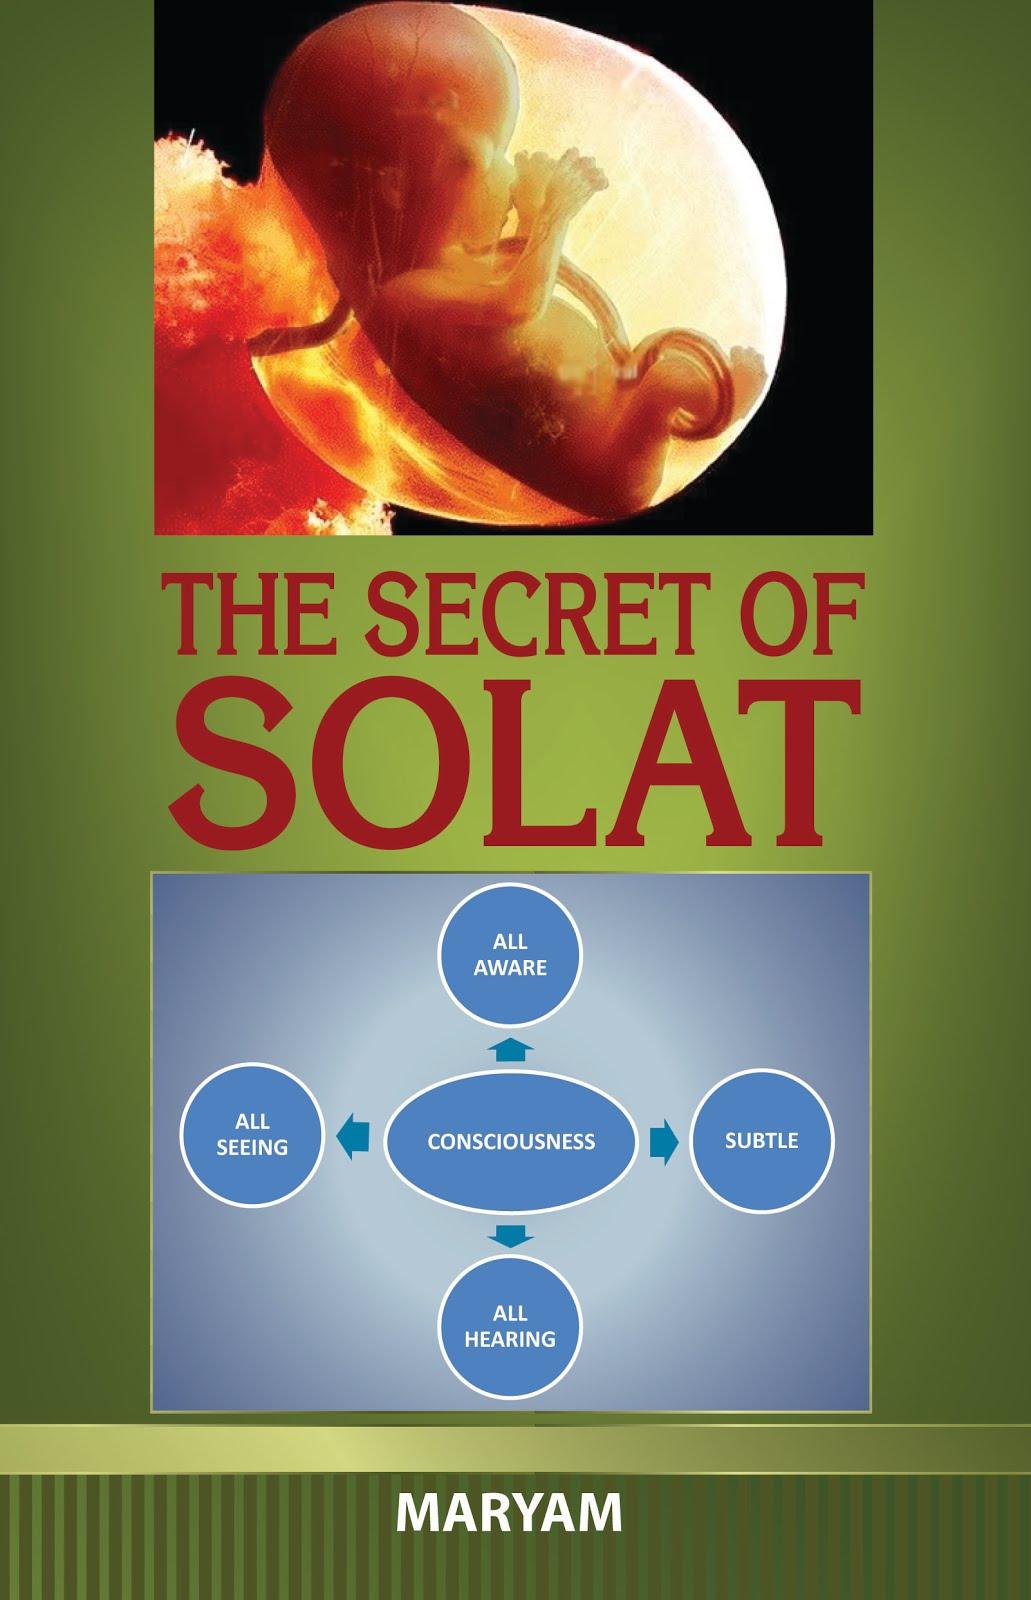 The Secret of Solat